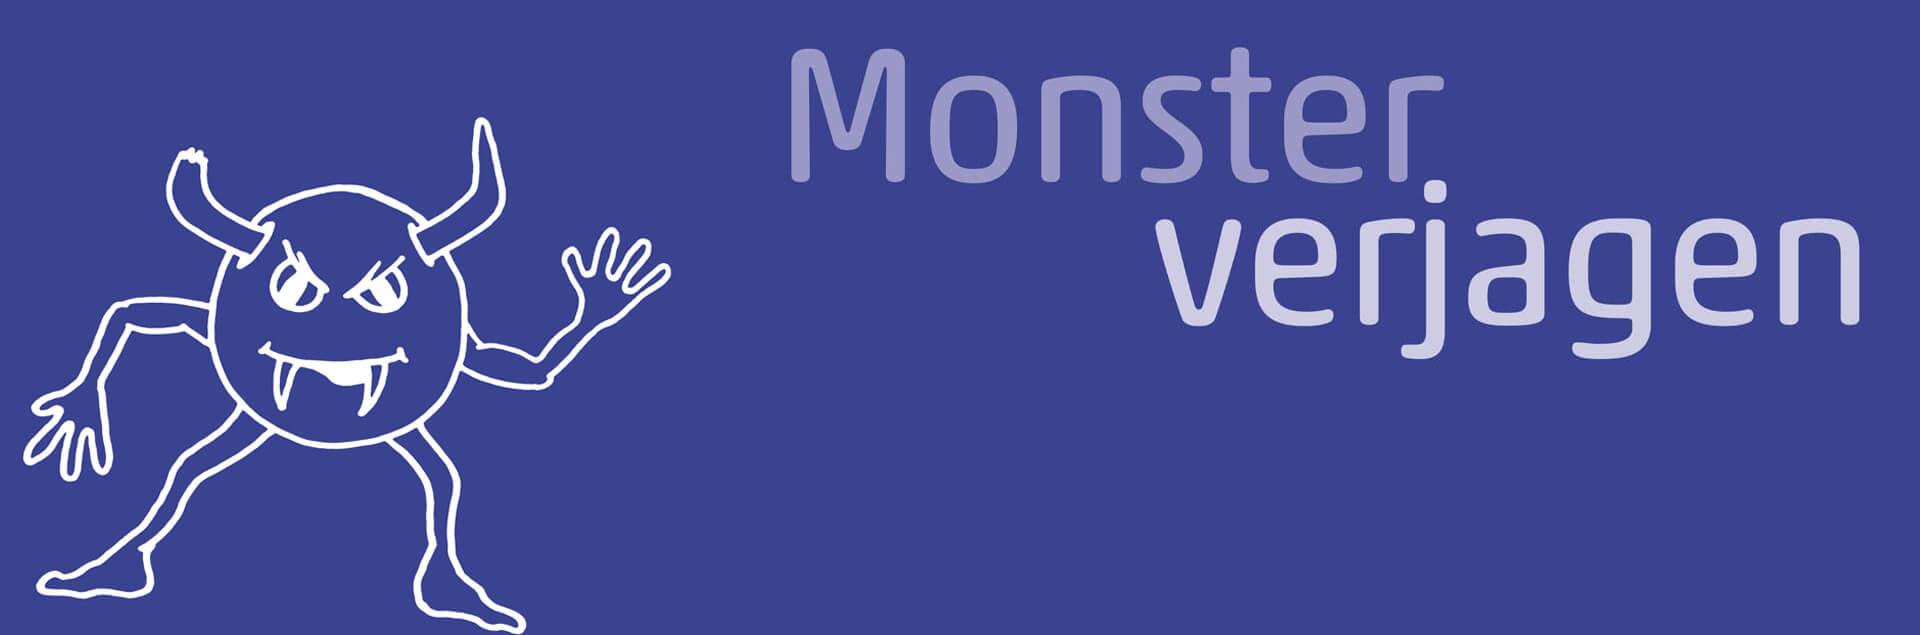 Jugendamt JAS Monster Headerbild web